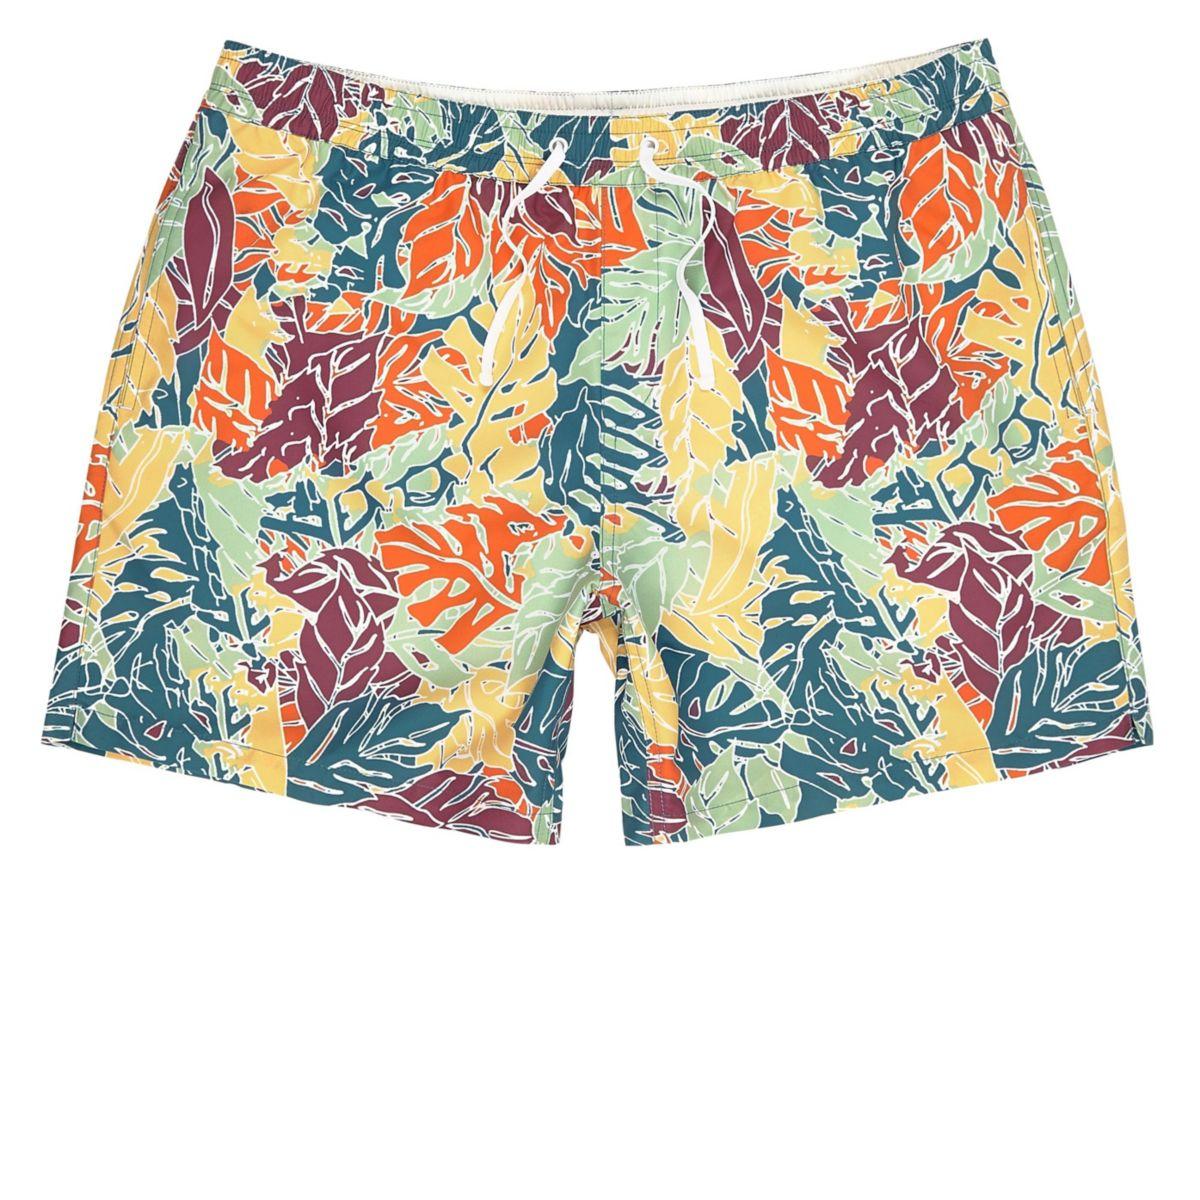 Orange palm tree print swim trunks